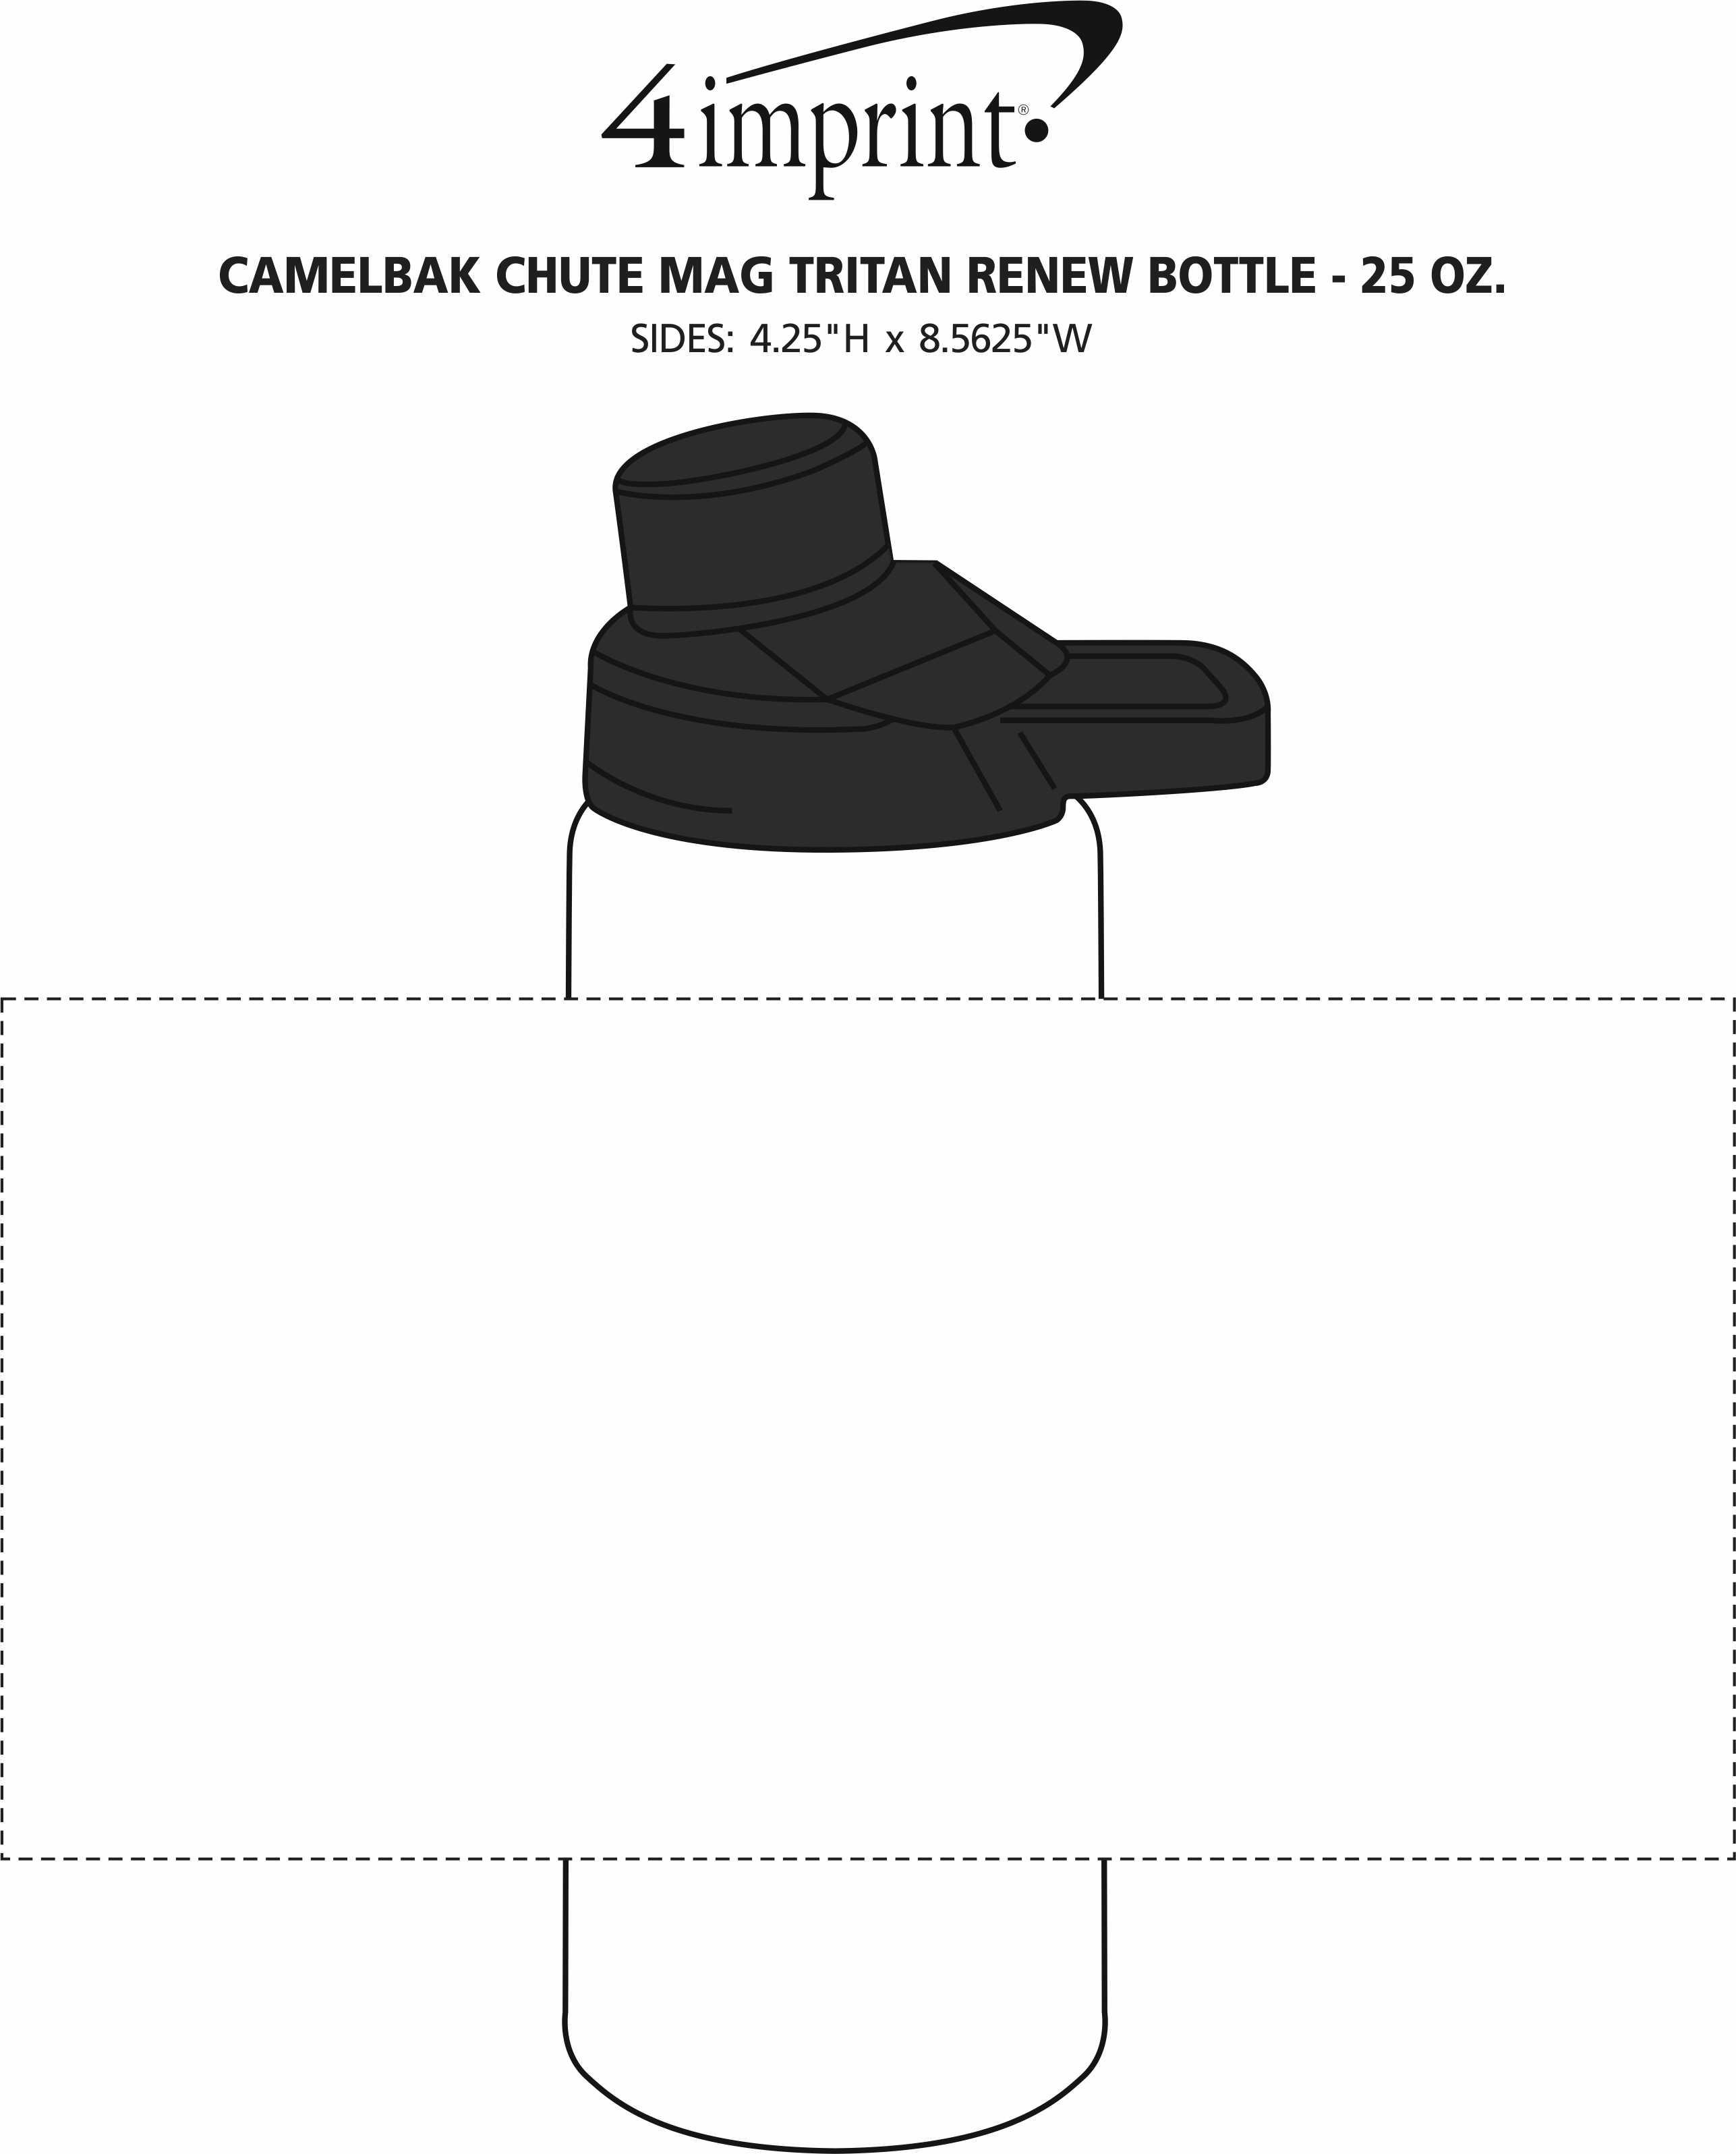 Imprint Area of CamelBak Chute Mag Tritan Renew Bottle - 25 oz.